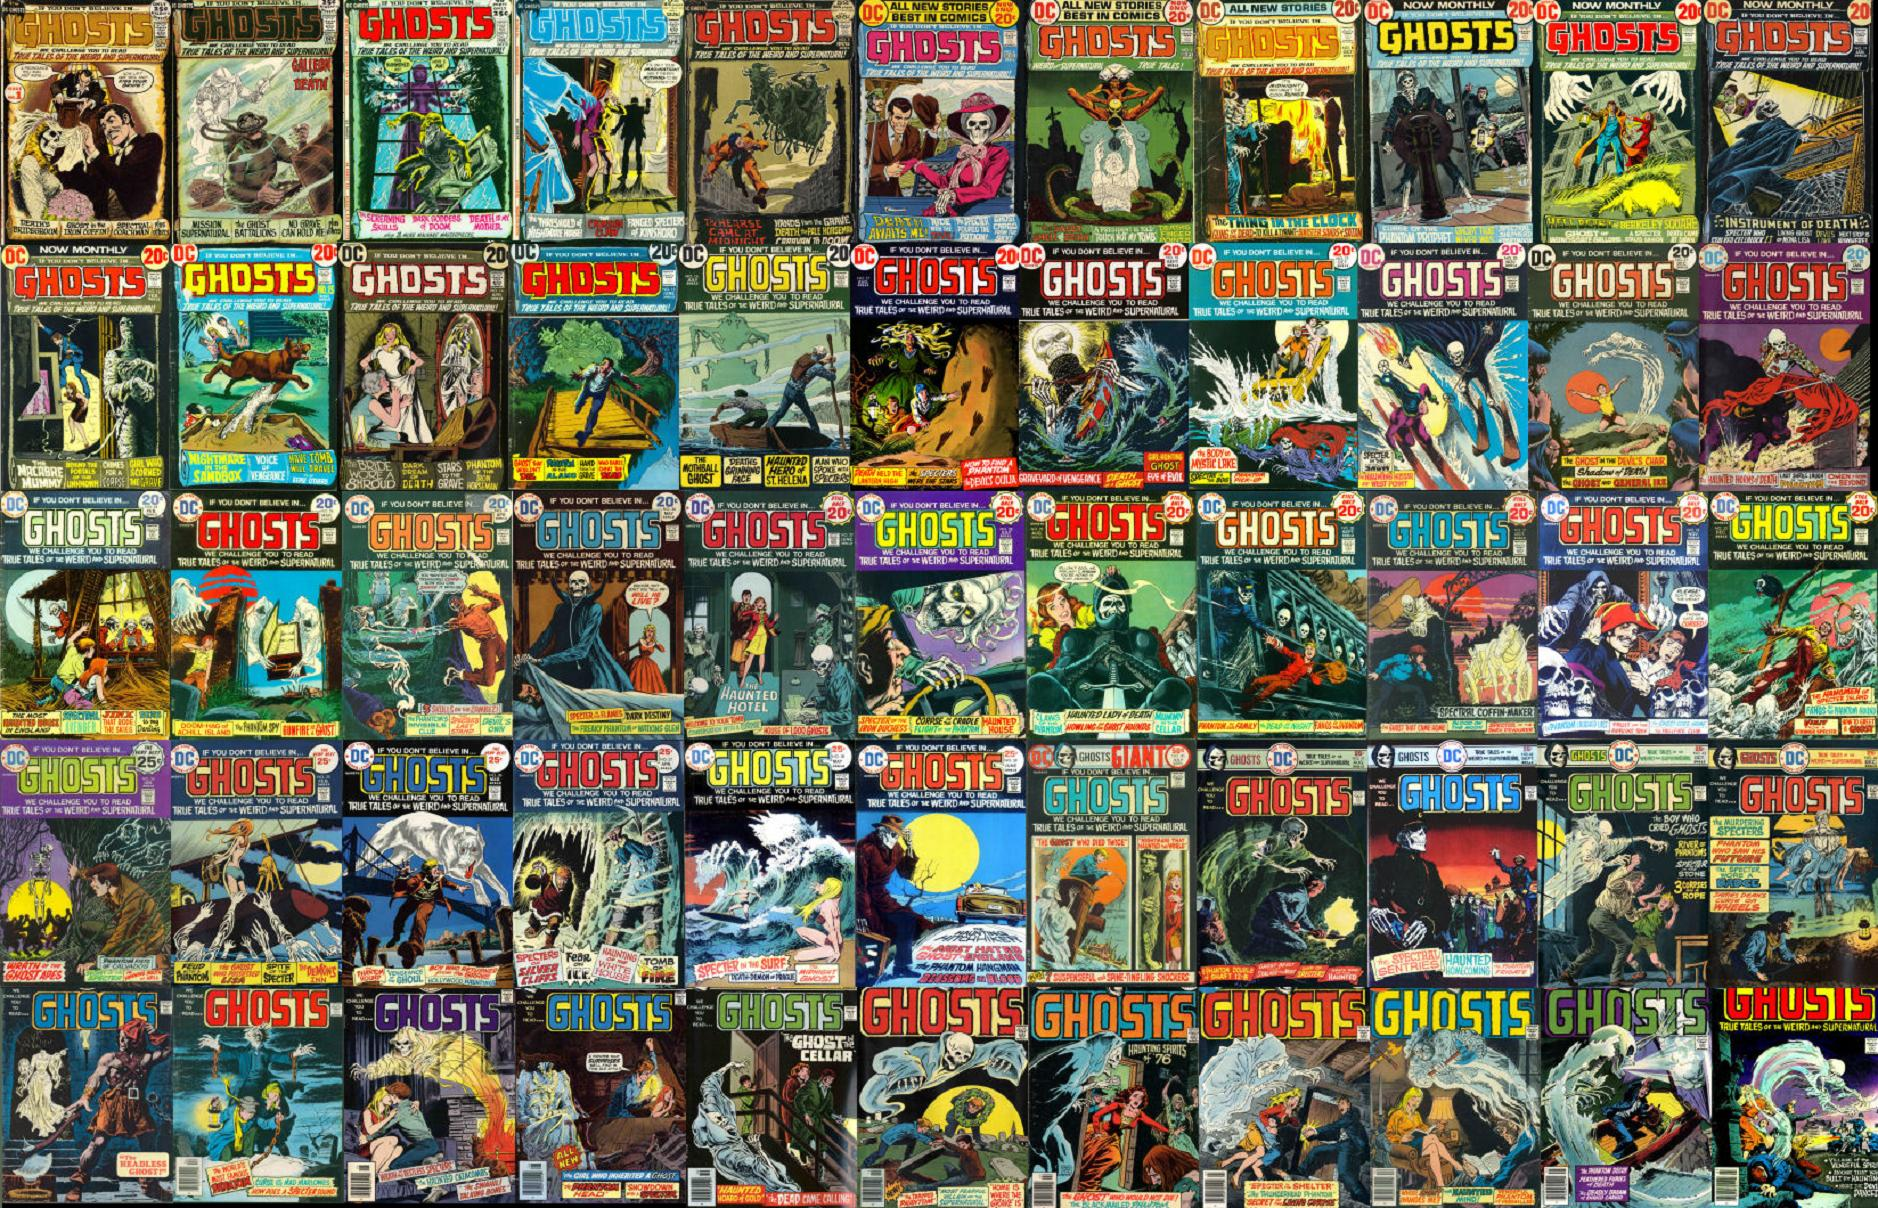 Universal Monsters Wallpaper Ghosts wallpaper 1878x1208